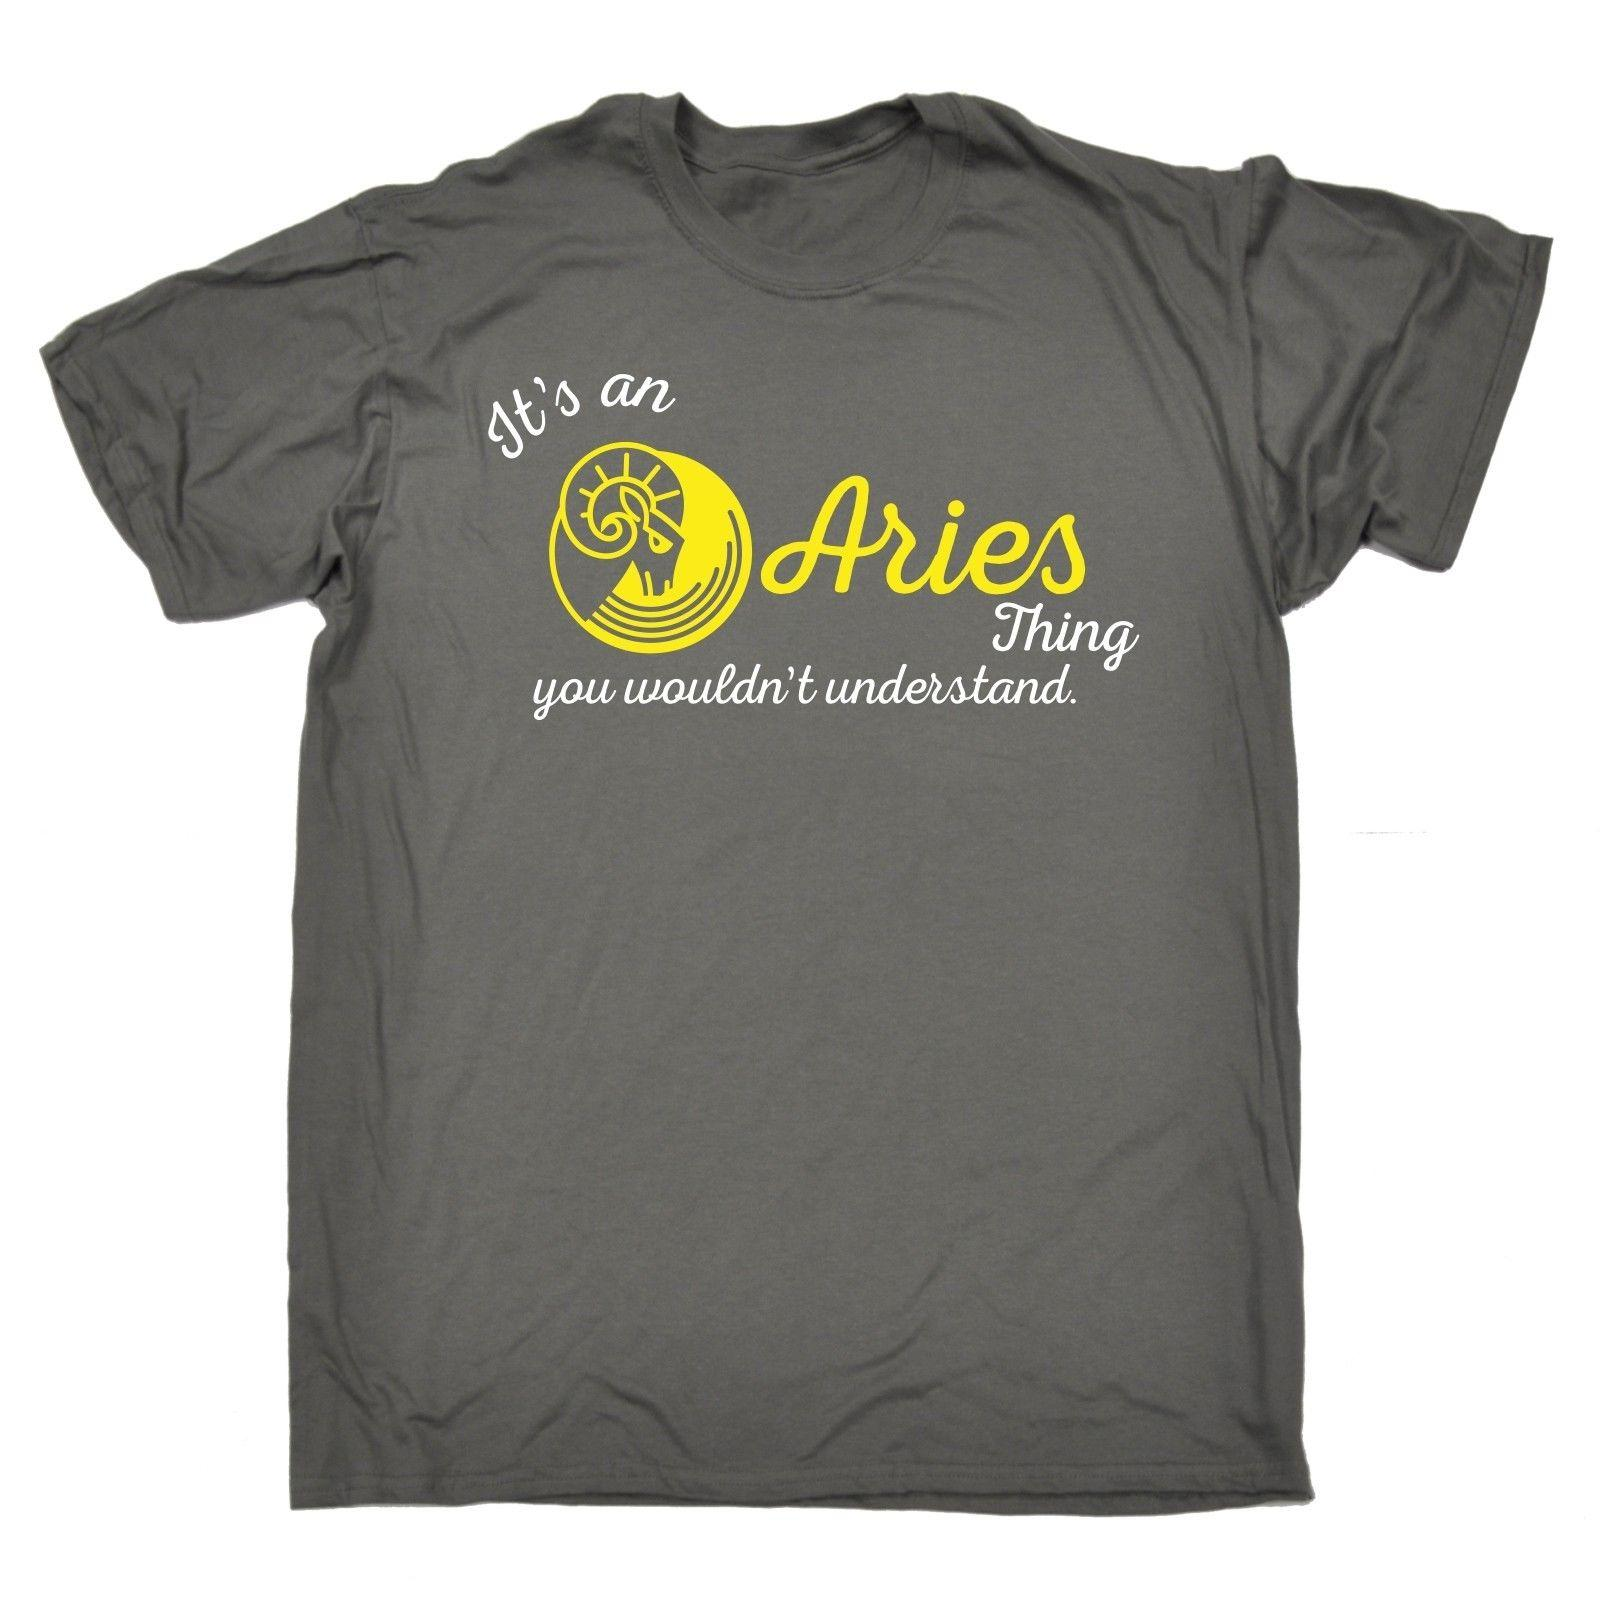 54f34cb4dd2b90 Its An Aries Thing Understand T SHIRT Tee Zodiac Astrology Birthday Fashion  Gift Men Women Unisex Fashion Tshirt Cotton Shirts White T Shirts From ...